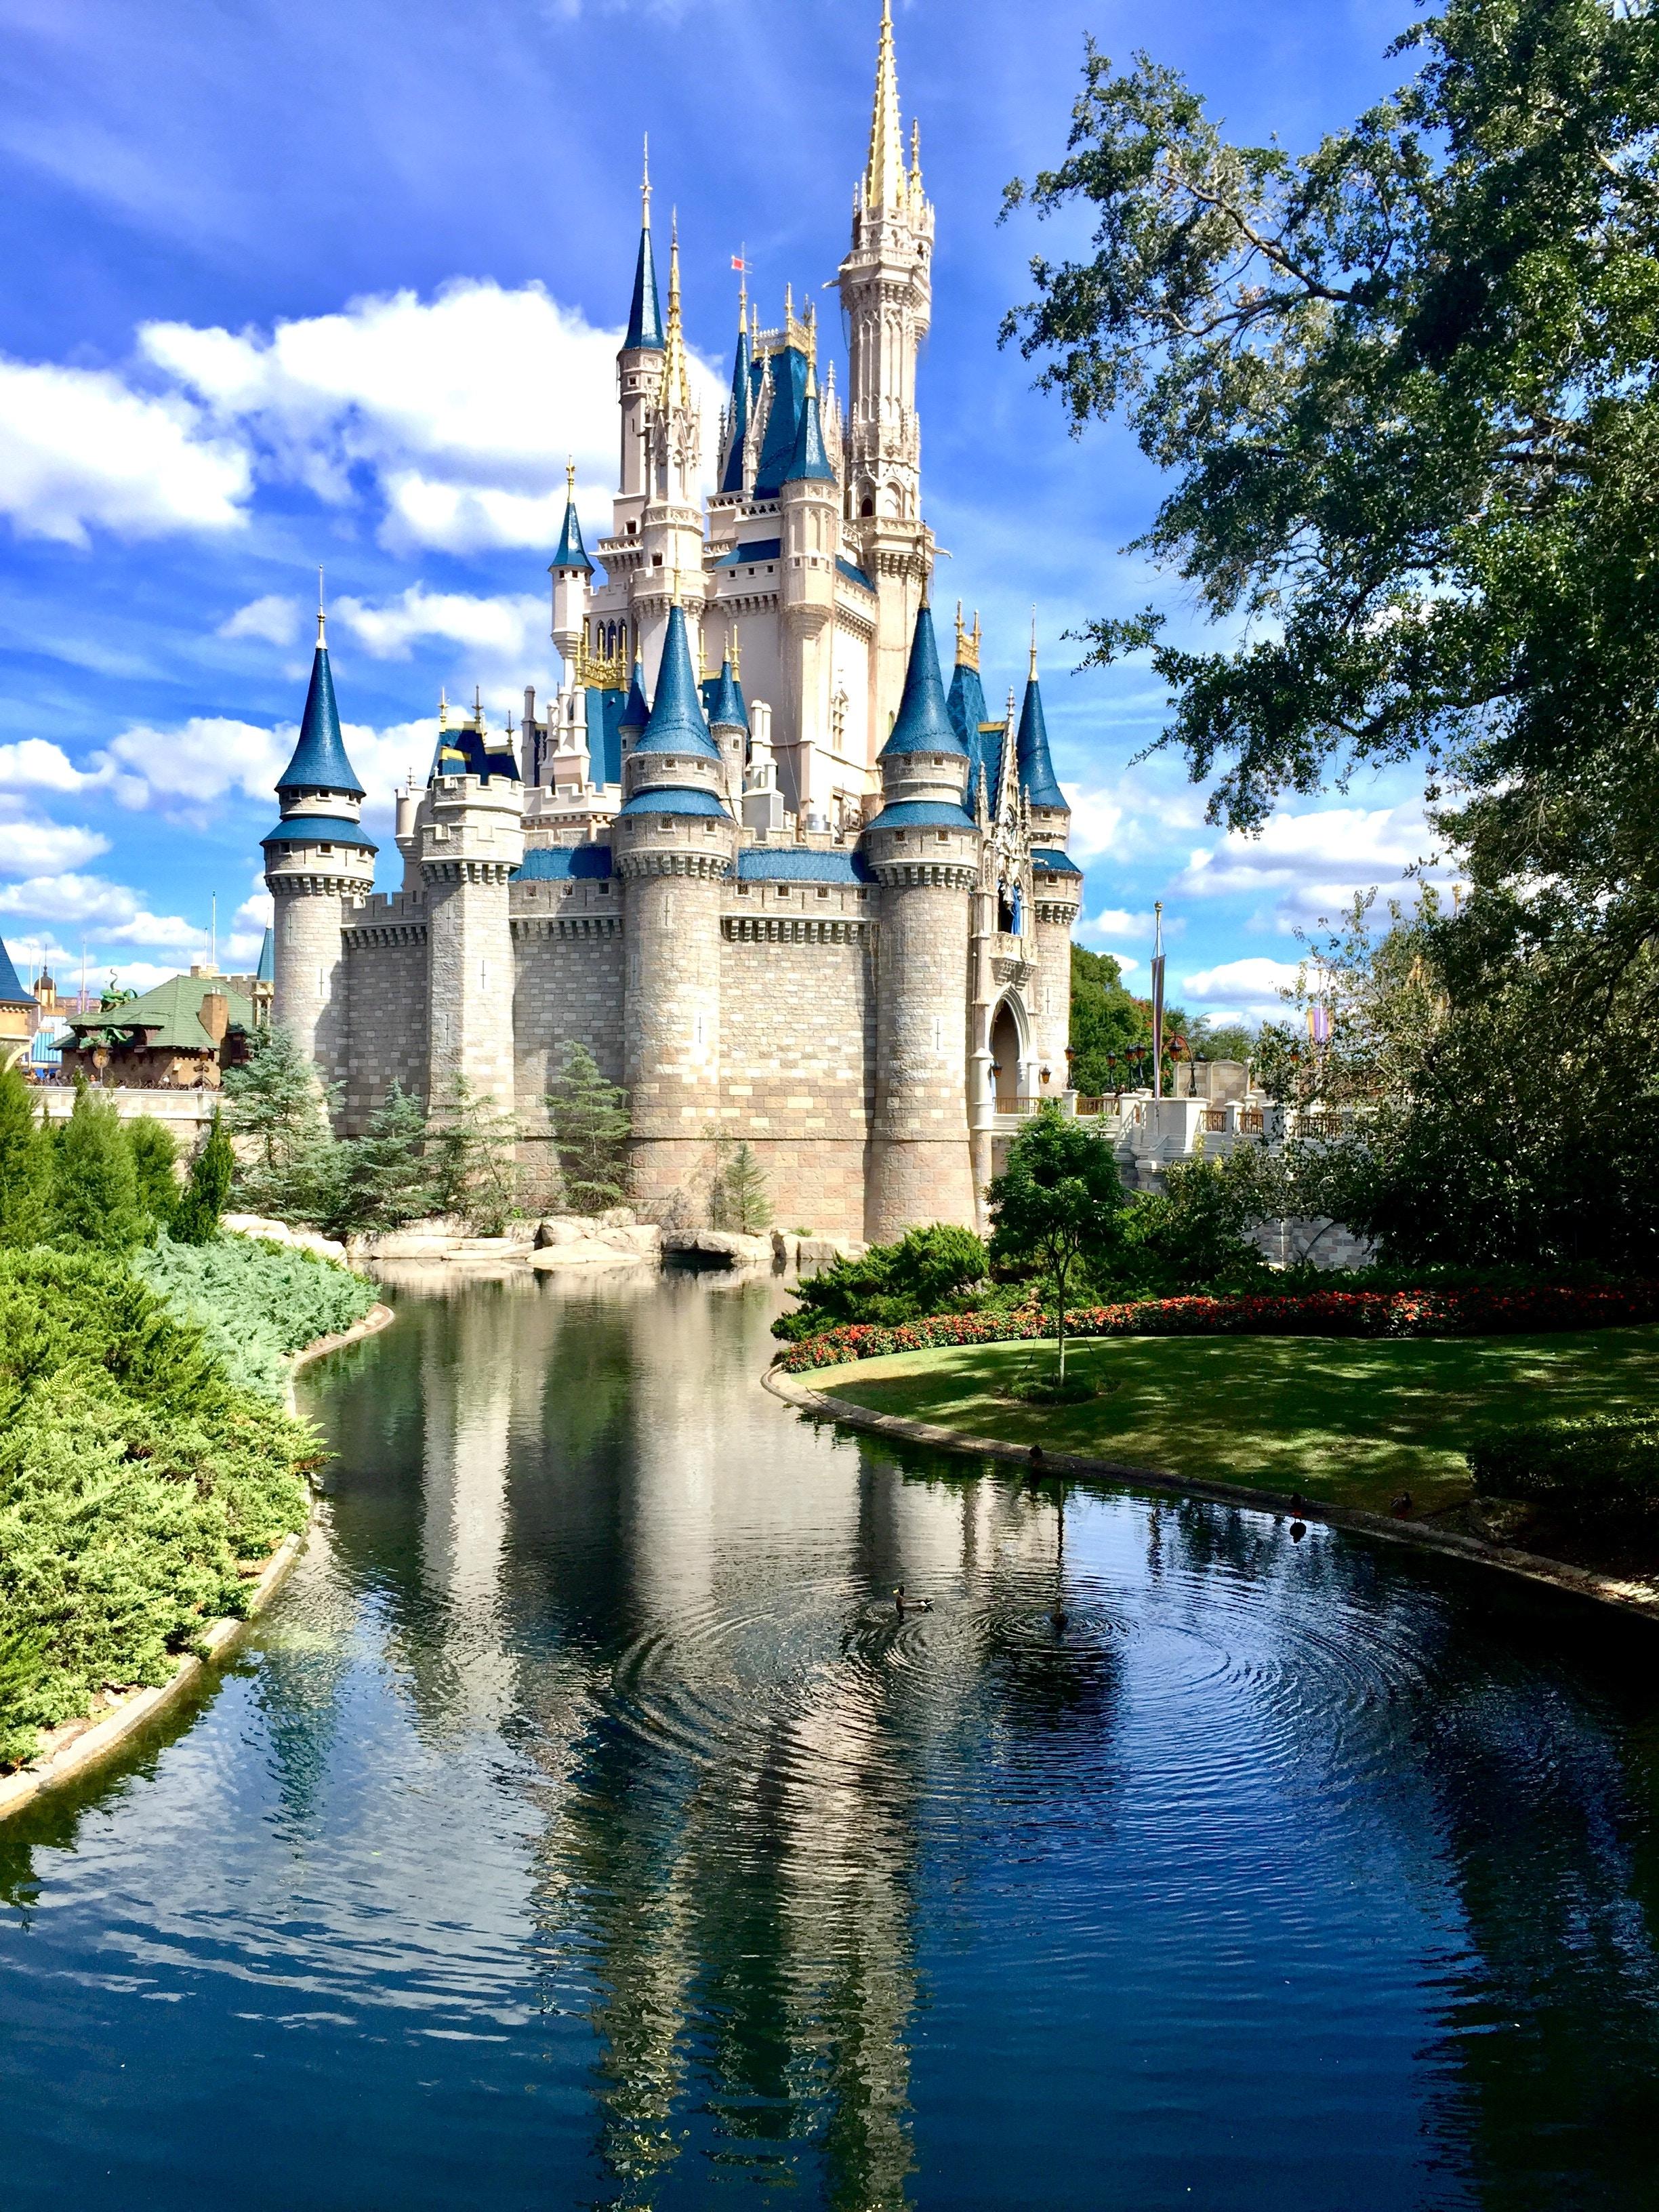 Cinderella's Castle at Disney's Magic Kingdom Park in Florida